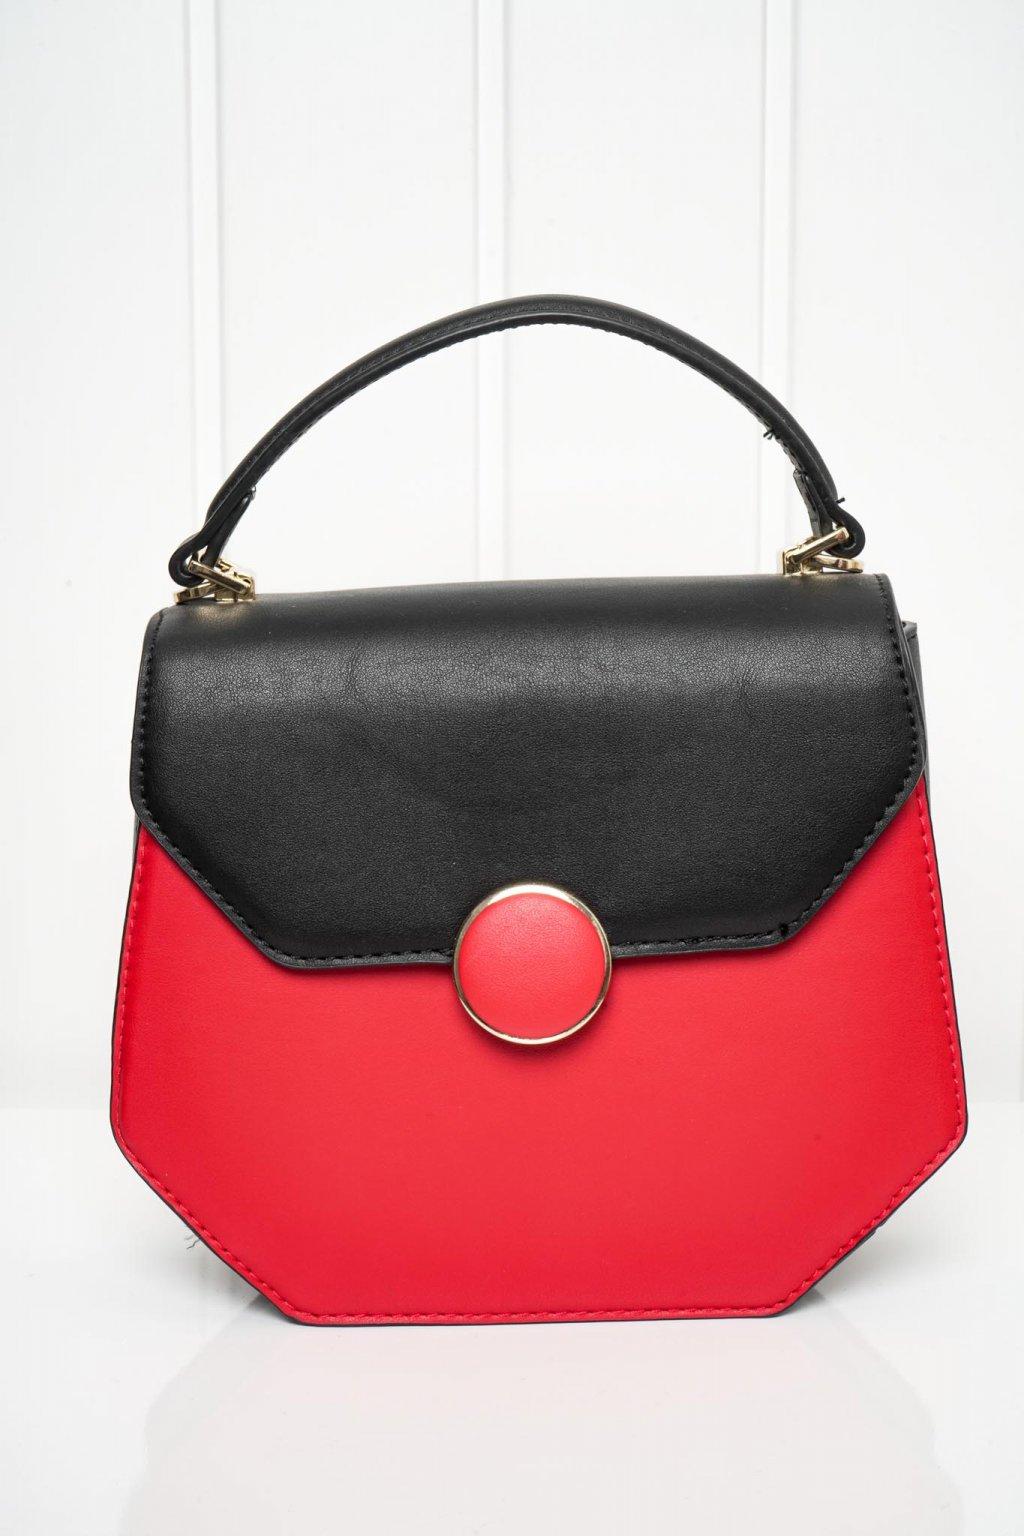 Kabelka, crossbody, ruksak, shopping bag, shopperka, 281